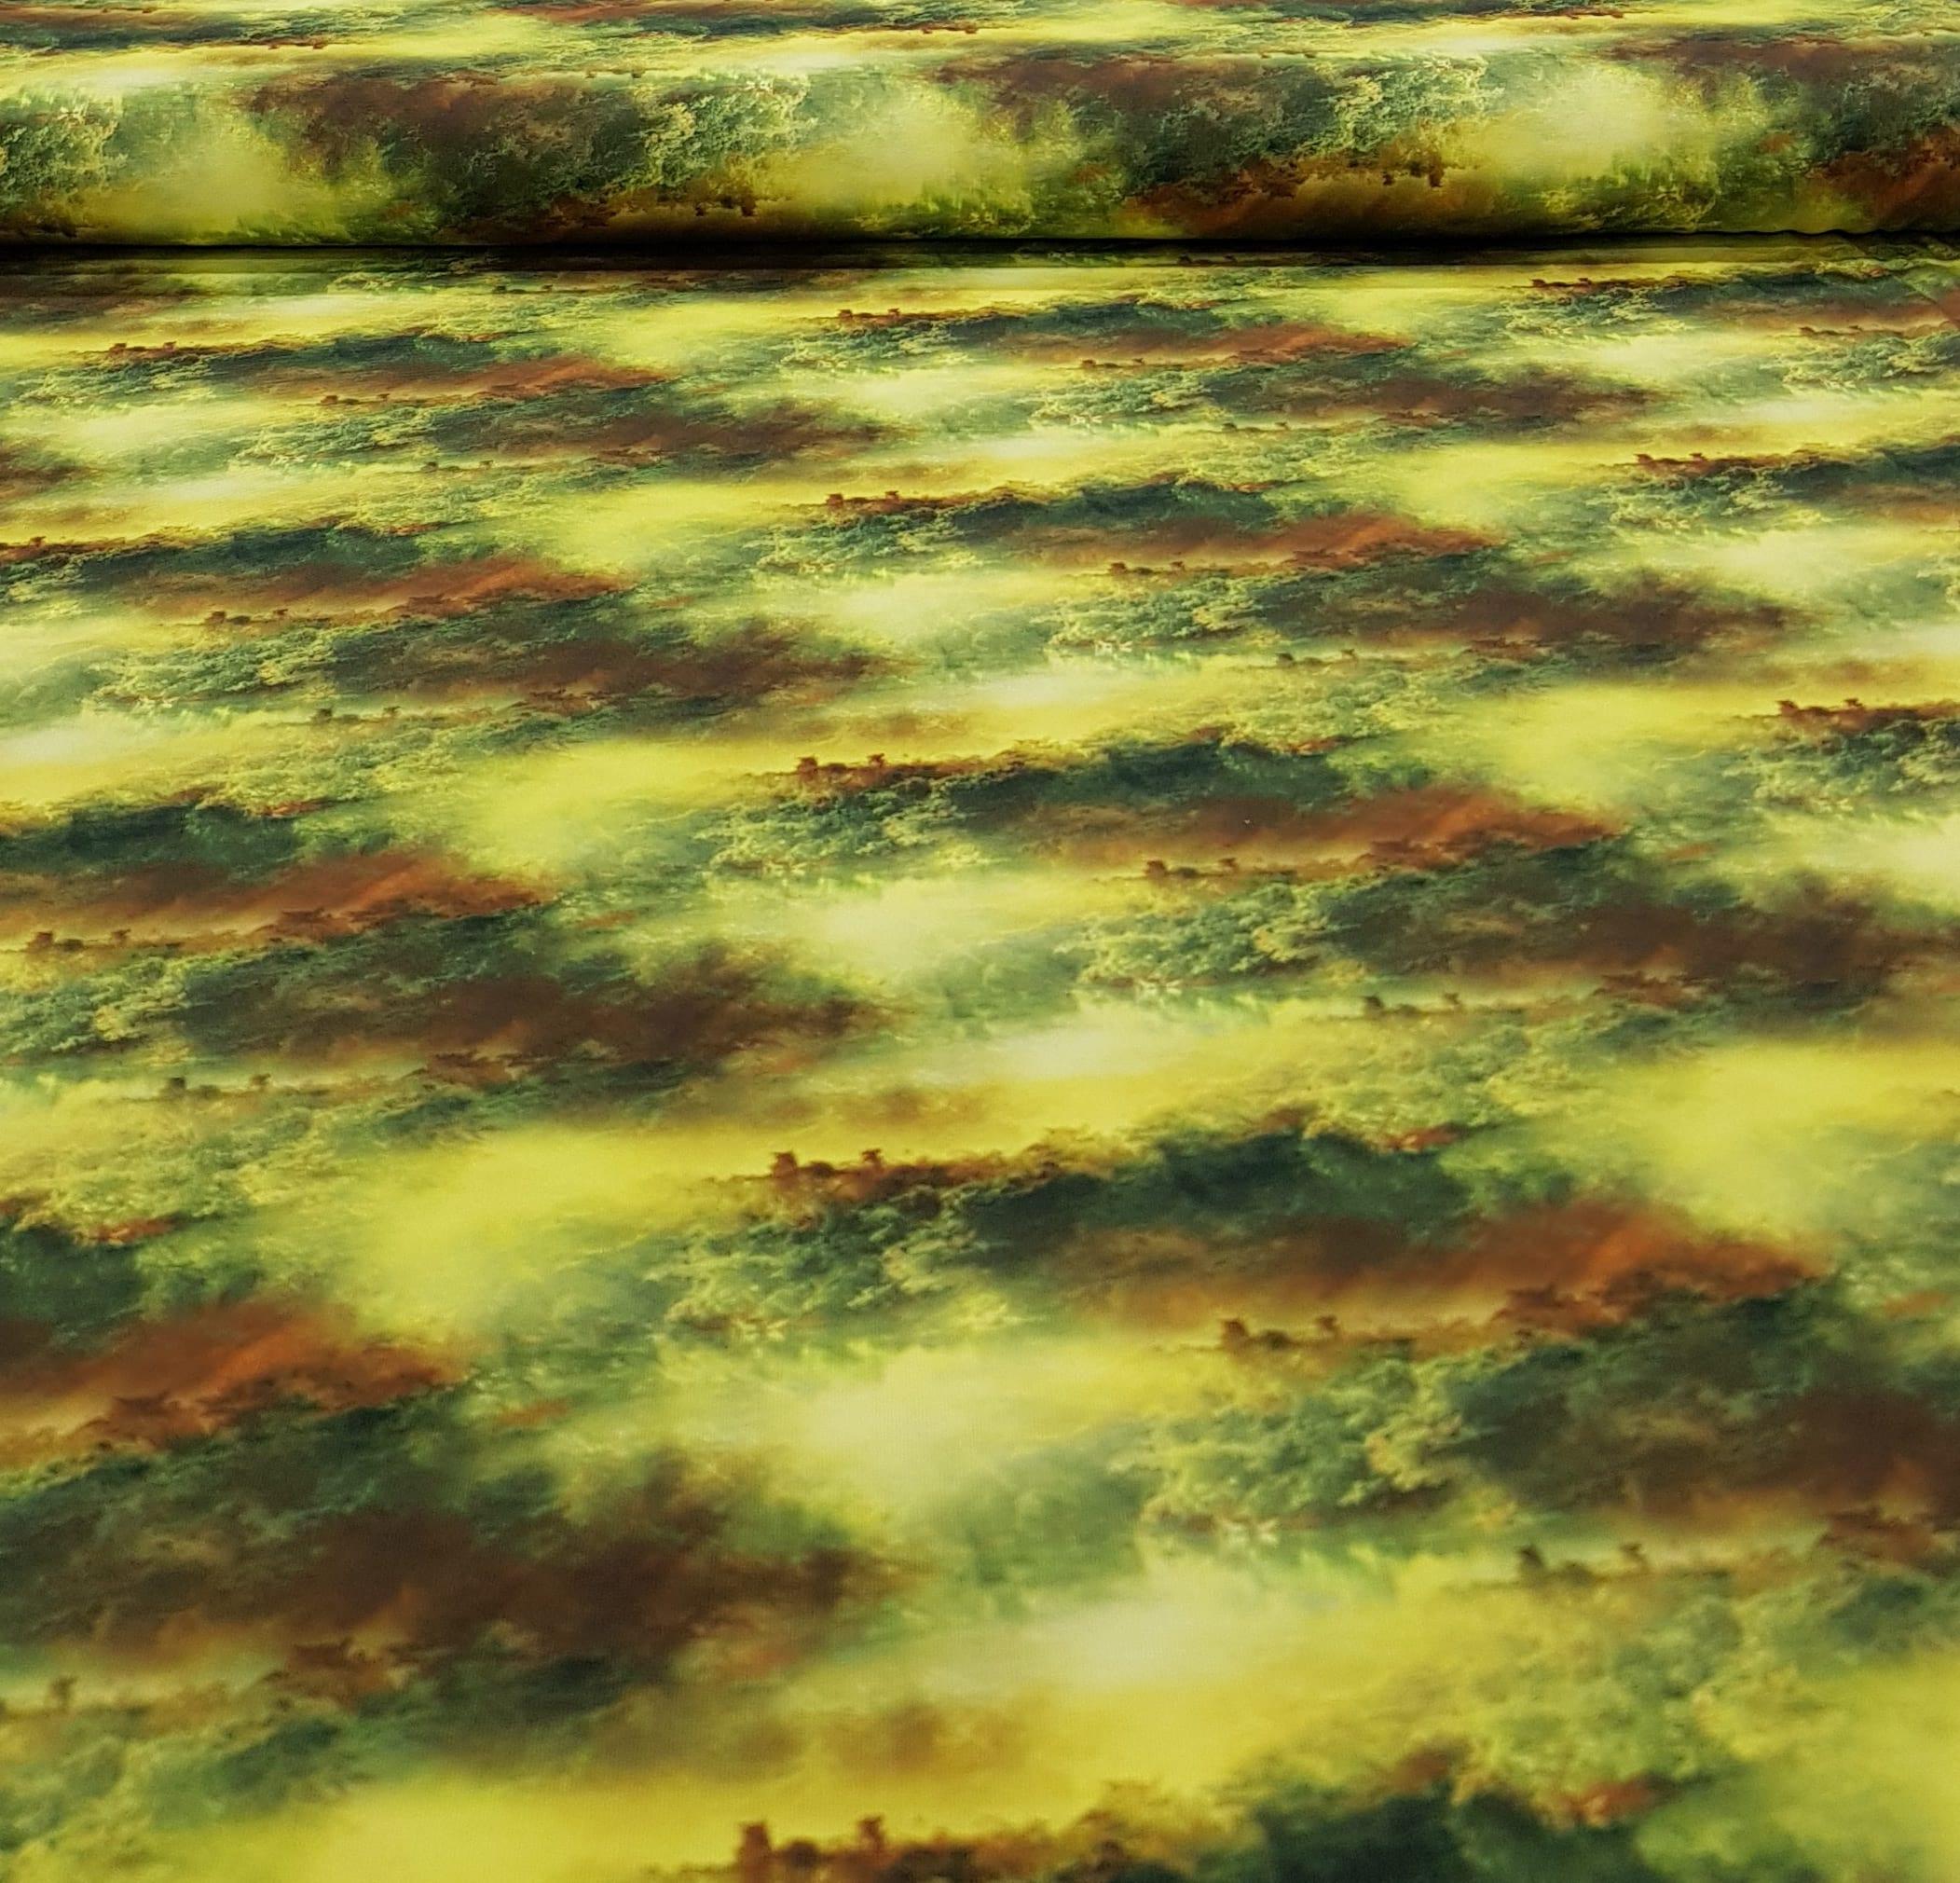 digitaletricotbosachtiggebiedgroen-min